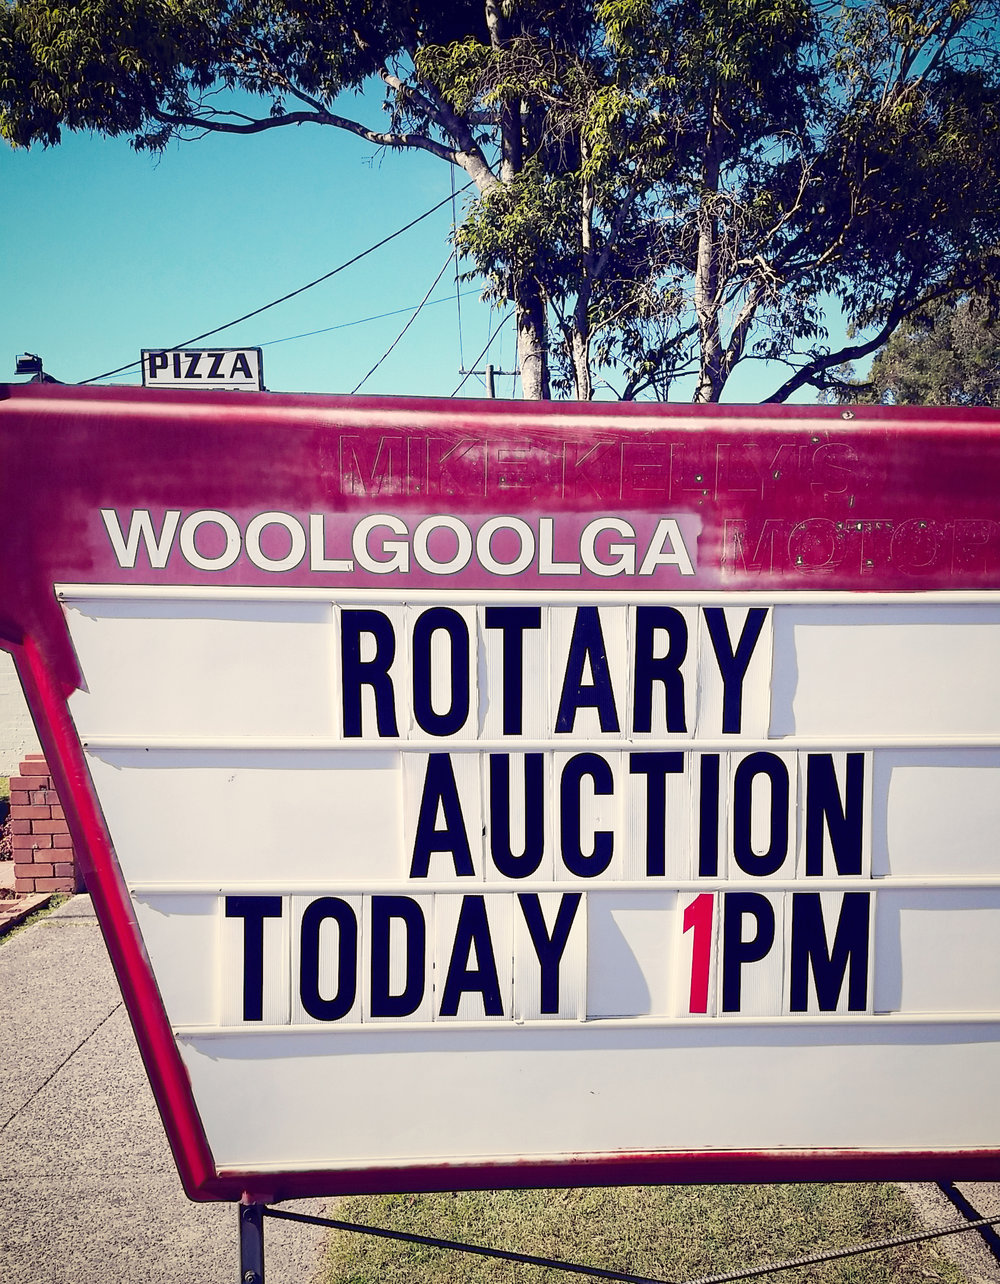 Woolgoolga Rotary Auction